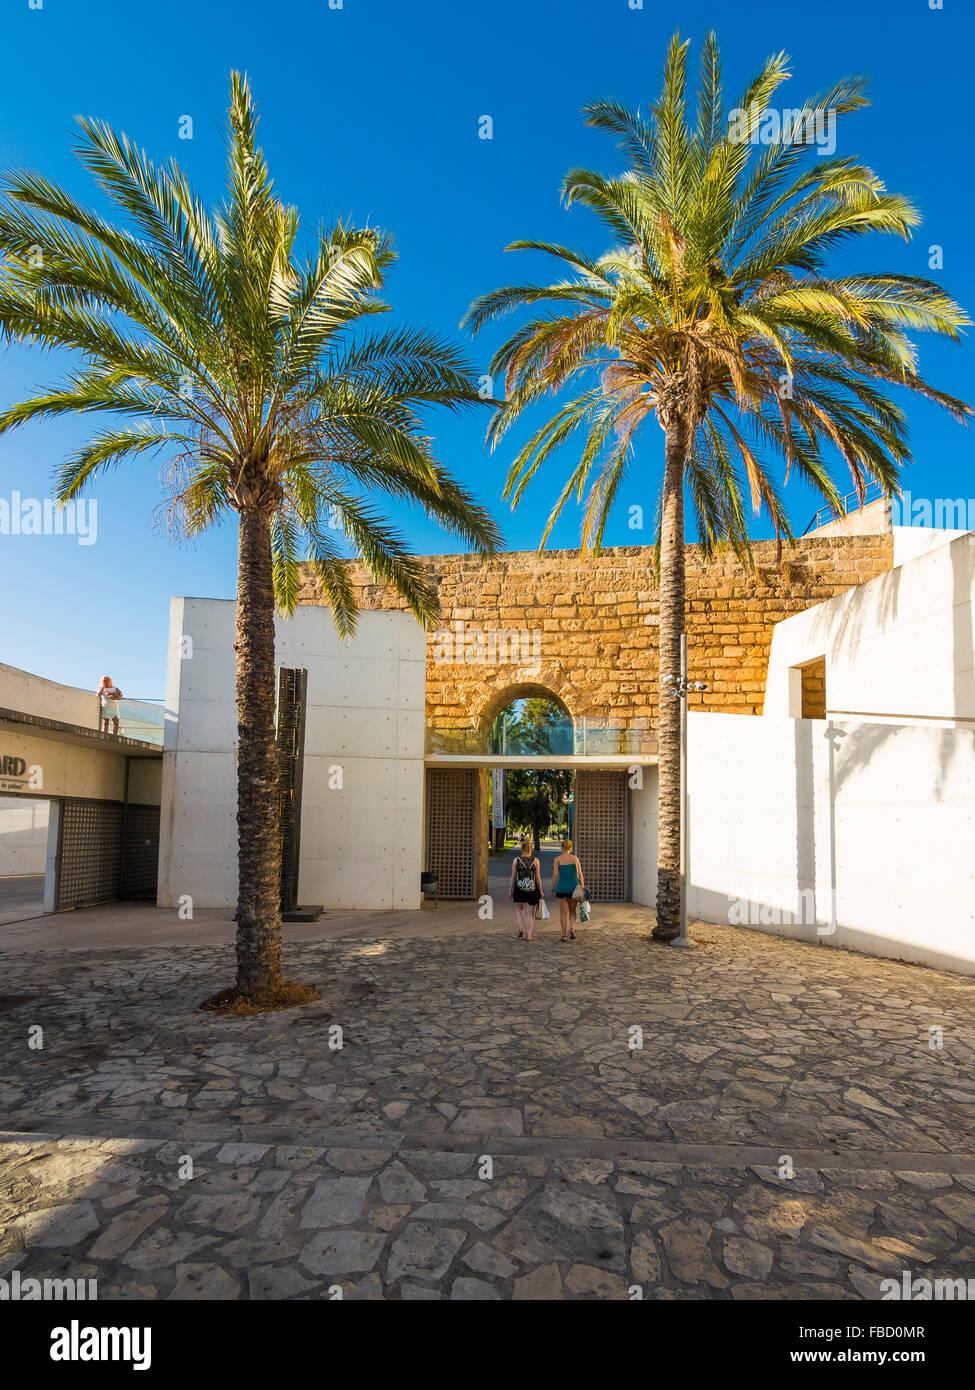 Museum Es Baluard Museum für moderne Kunst, Bastion de Sant Pere, Palma de Mallorca, Mallorca, Balearen, Spanien Stockbild